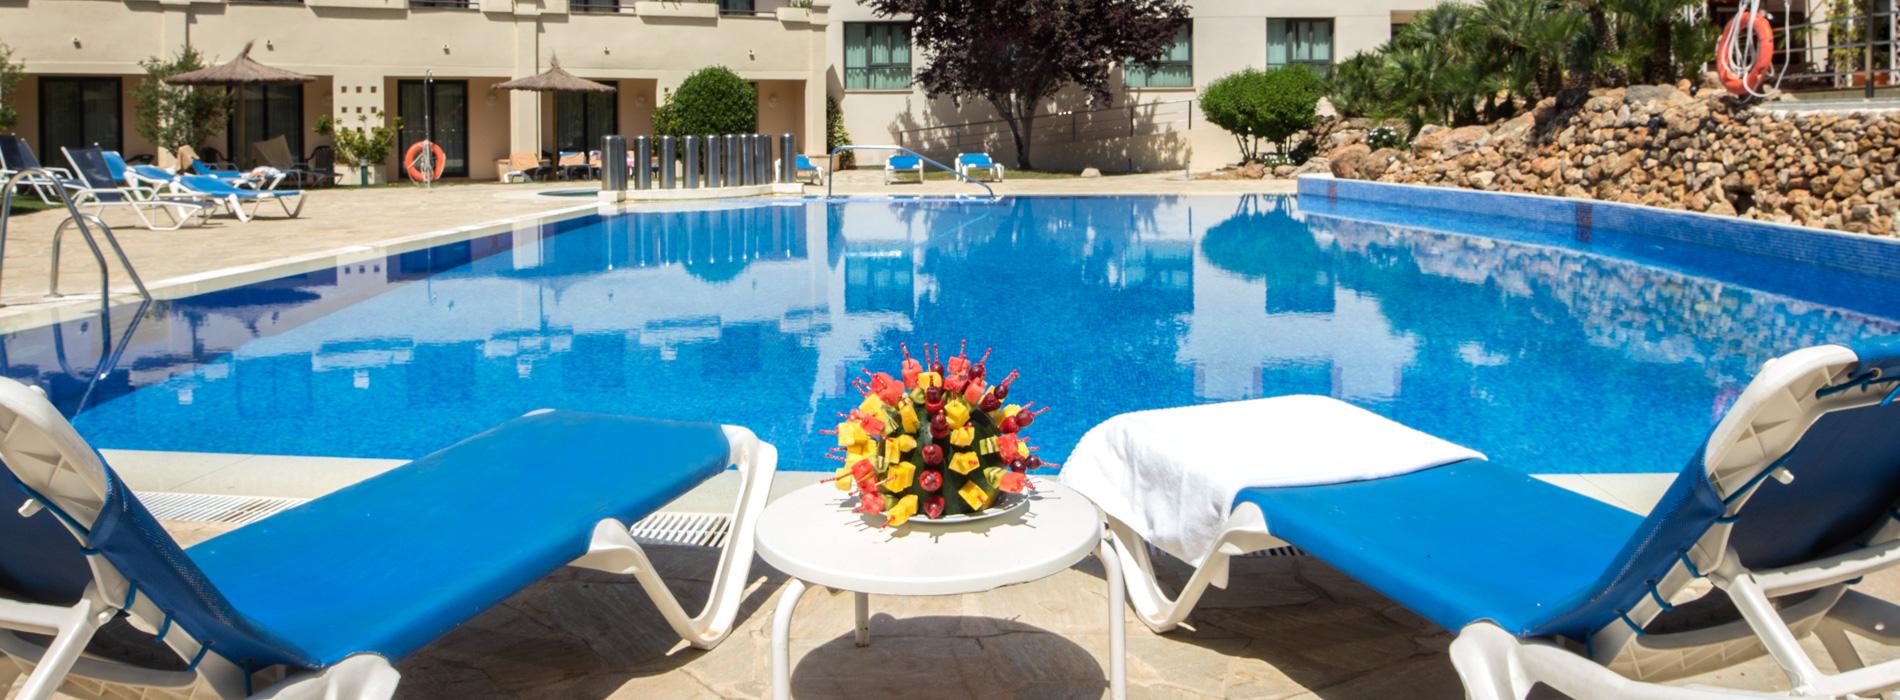 Hotel Antequera by Checkin | Antequera | Web Oficial